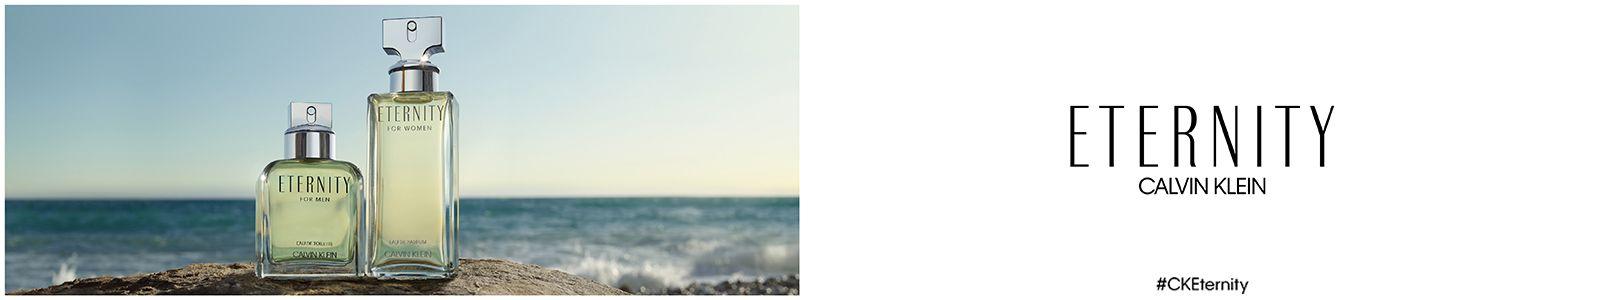 Eternity, Calvin Klein, Cketernity